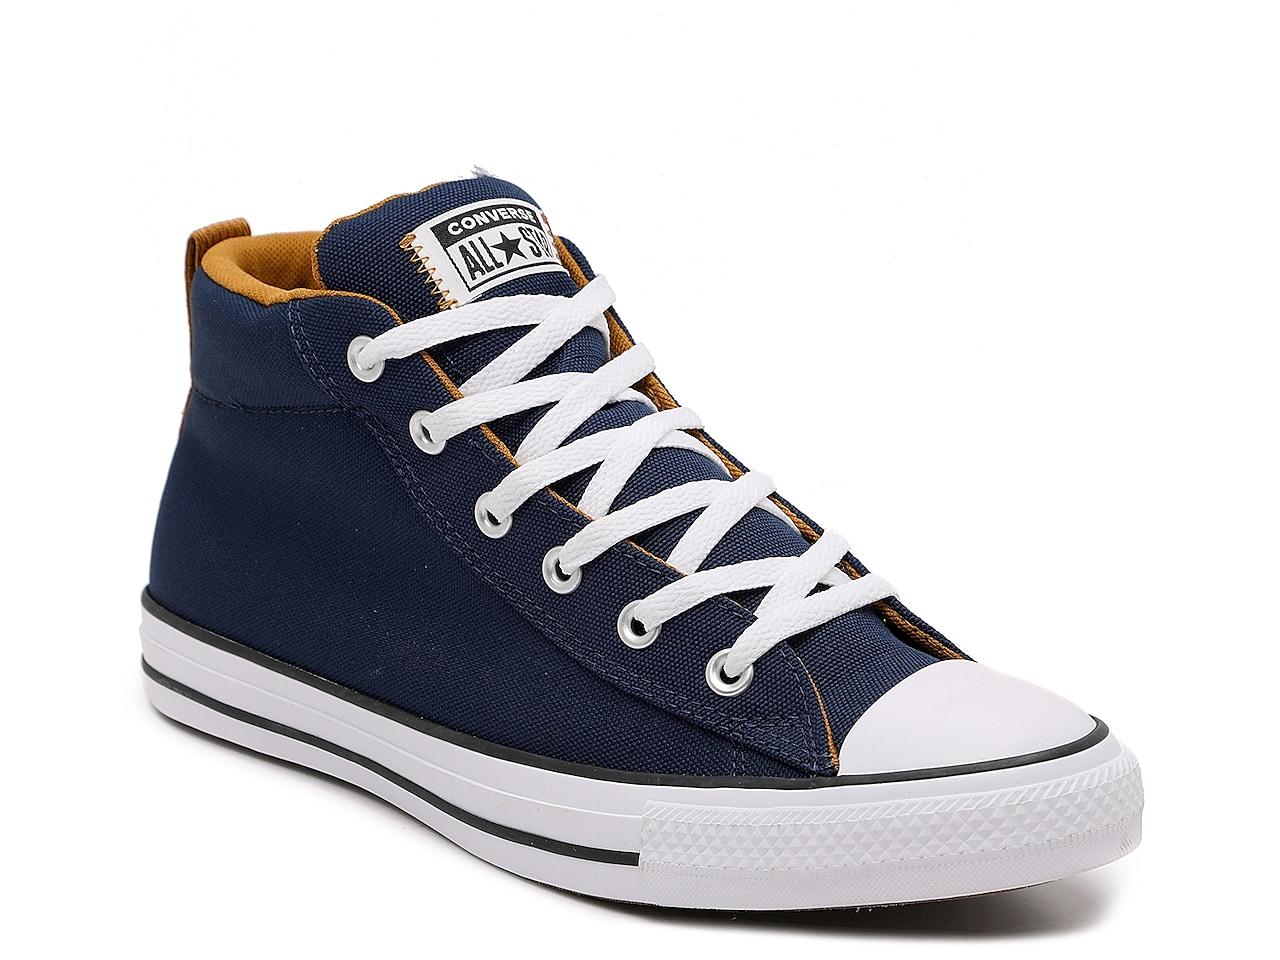 Chuck Taylor All Star Street Mid-Top Sneaker - Men's